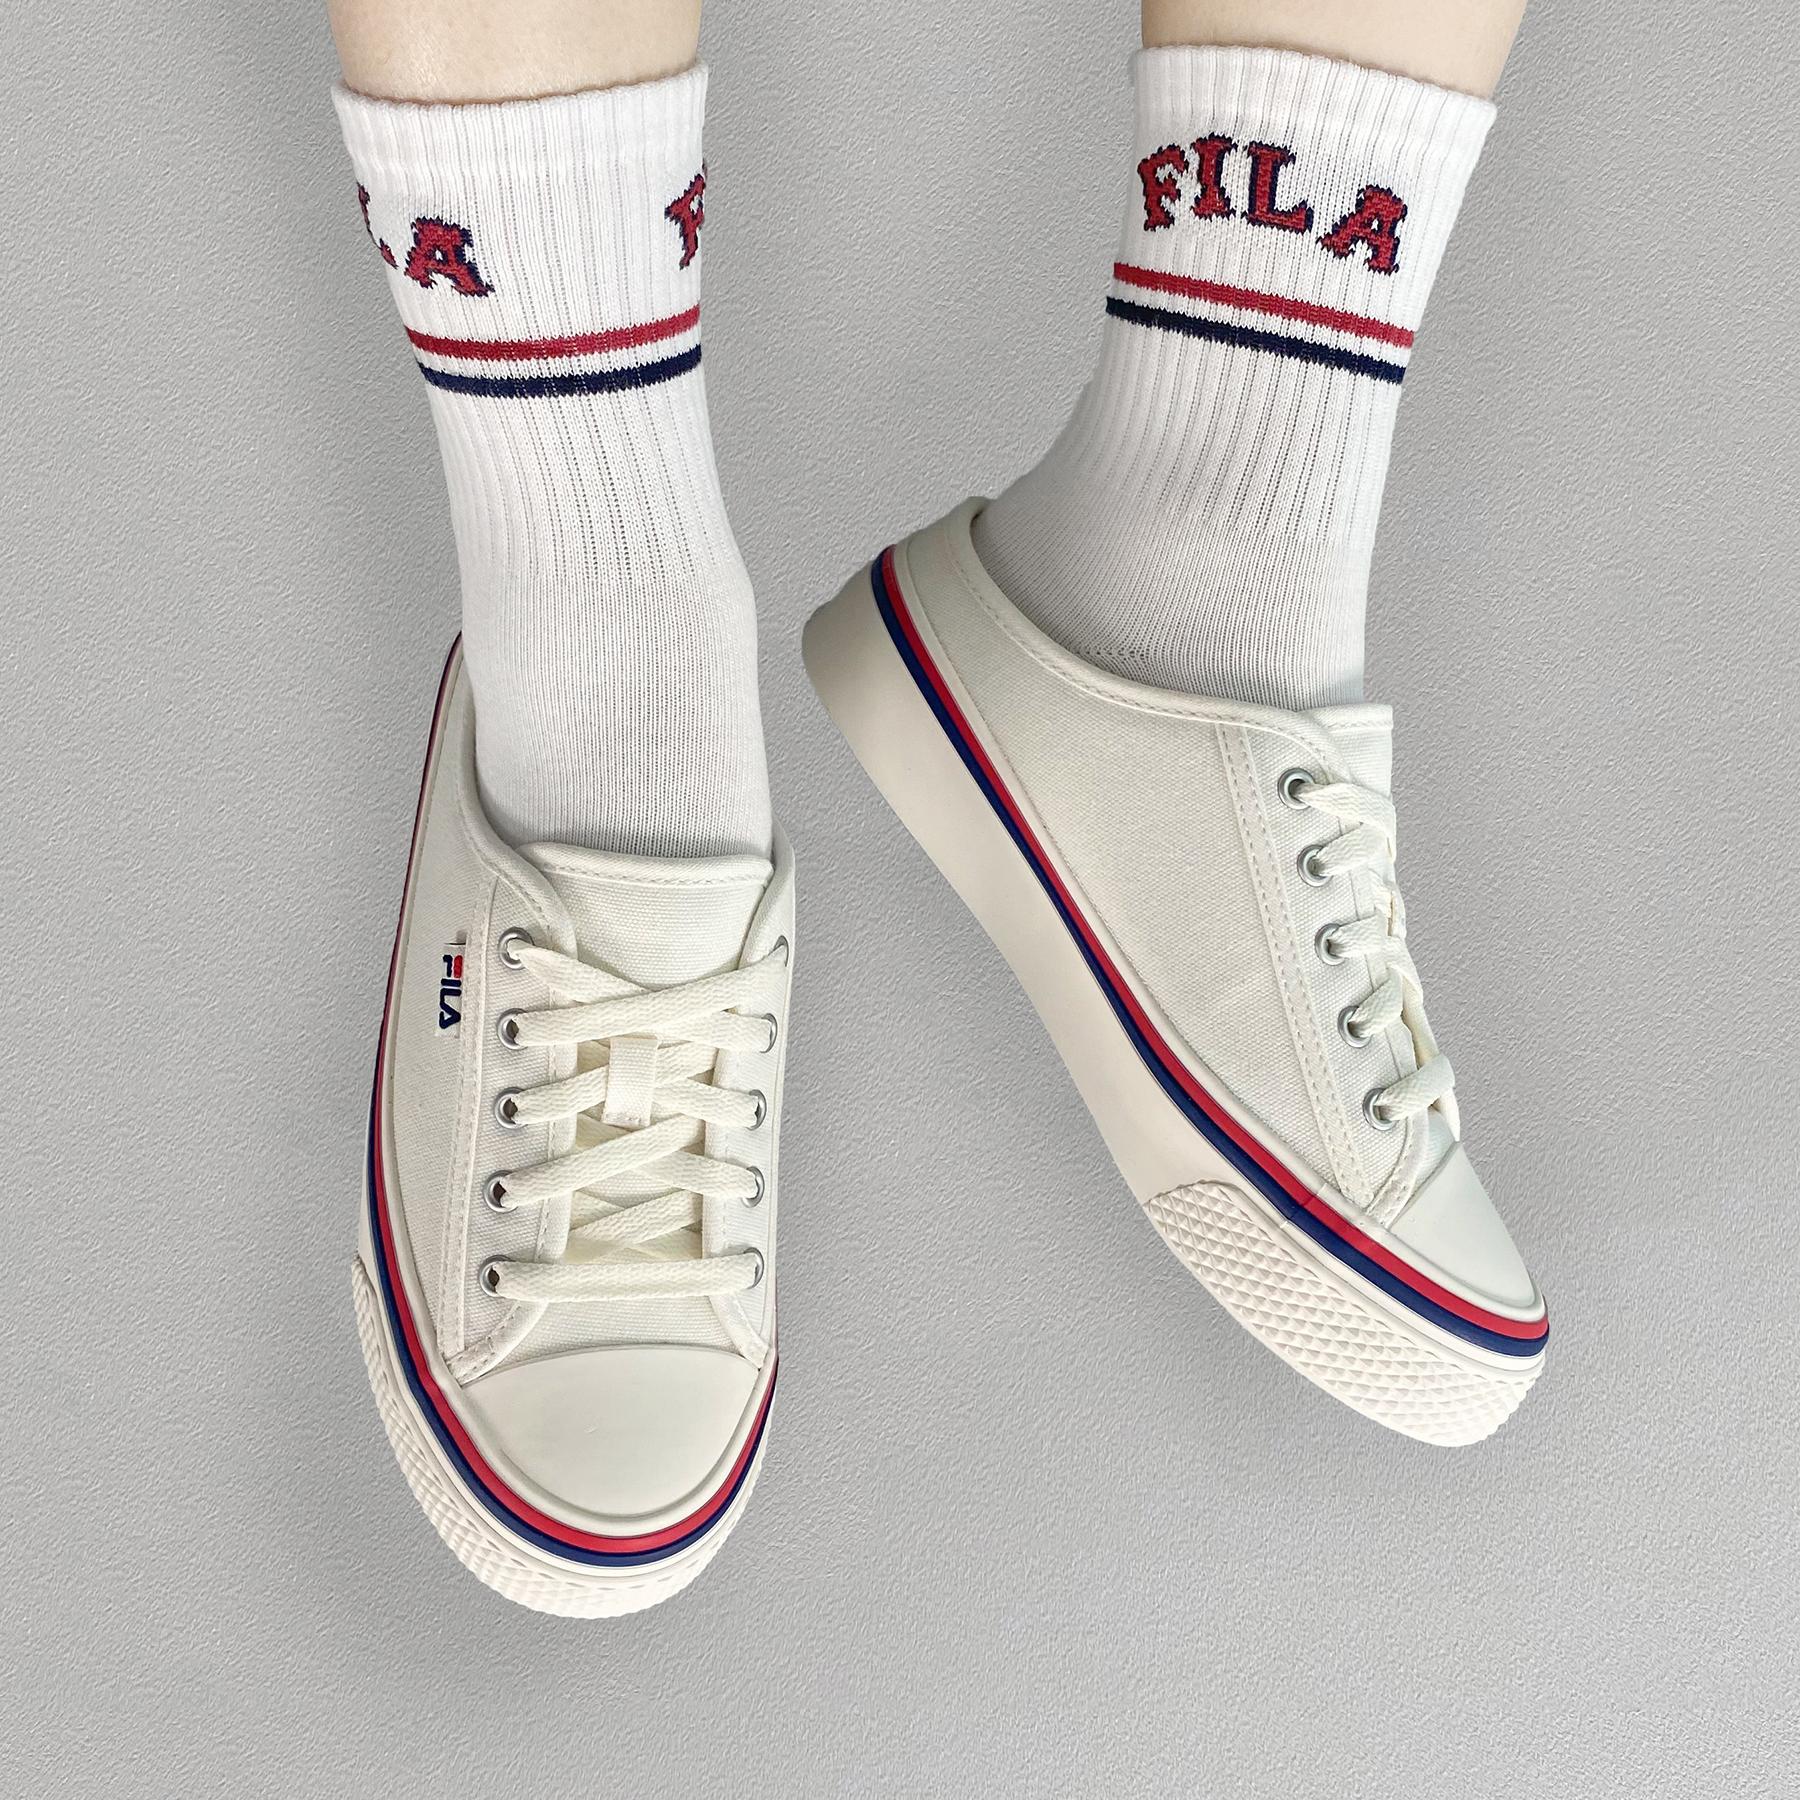 韓國FILA SCANLINE MULE 綁帶布鞋 (白色)